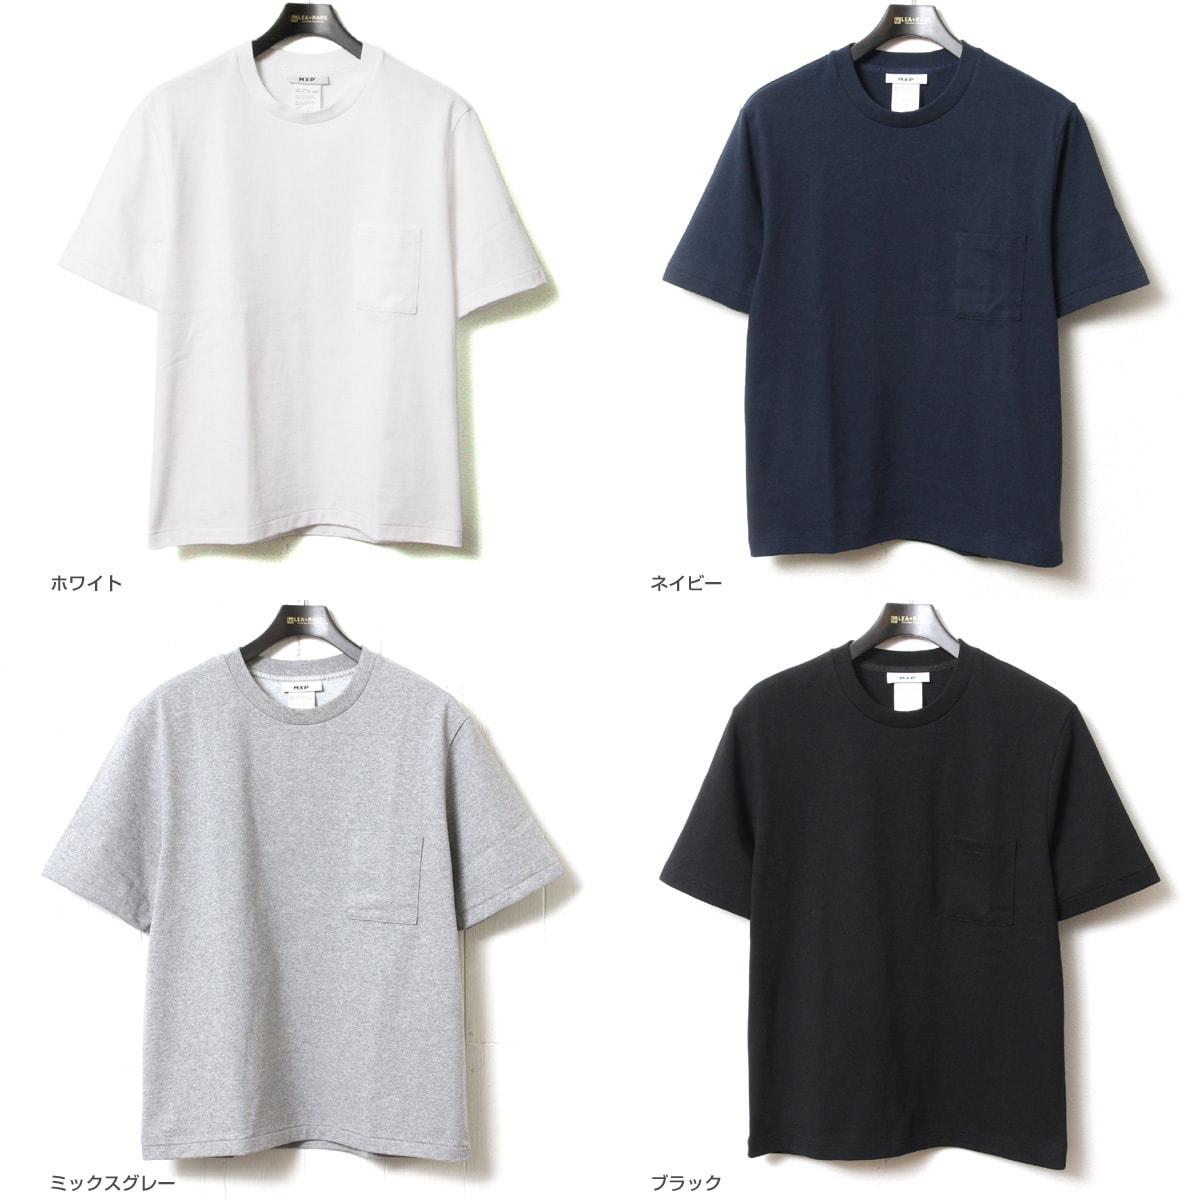 MXP ドライジャージ ビッグシルエットポケット付半袖Tシャツ MX36152